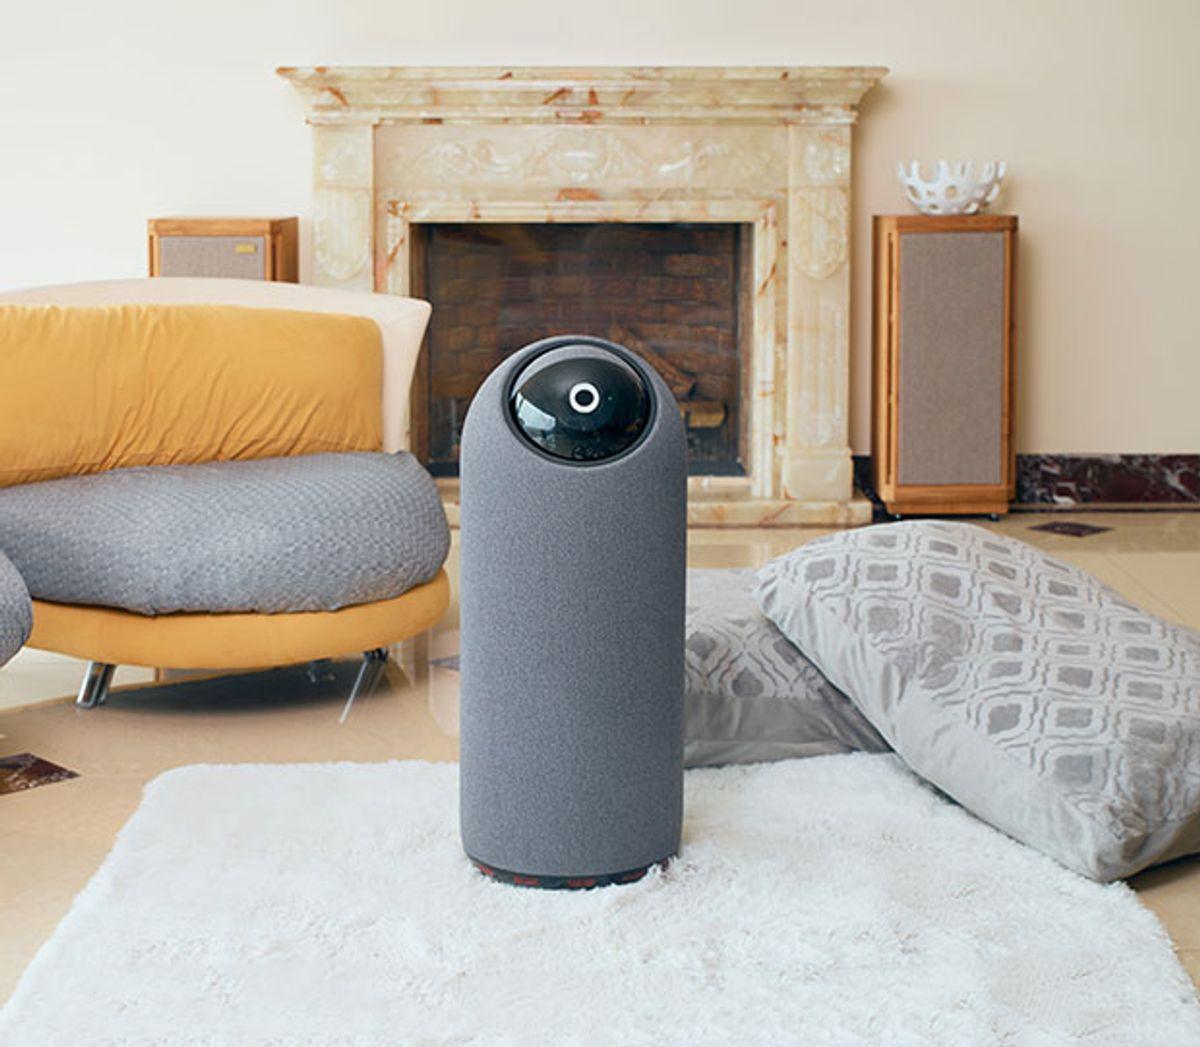 BIG-i personal home robot